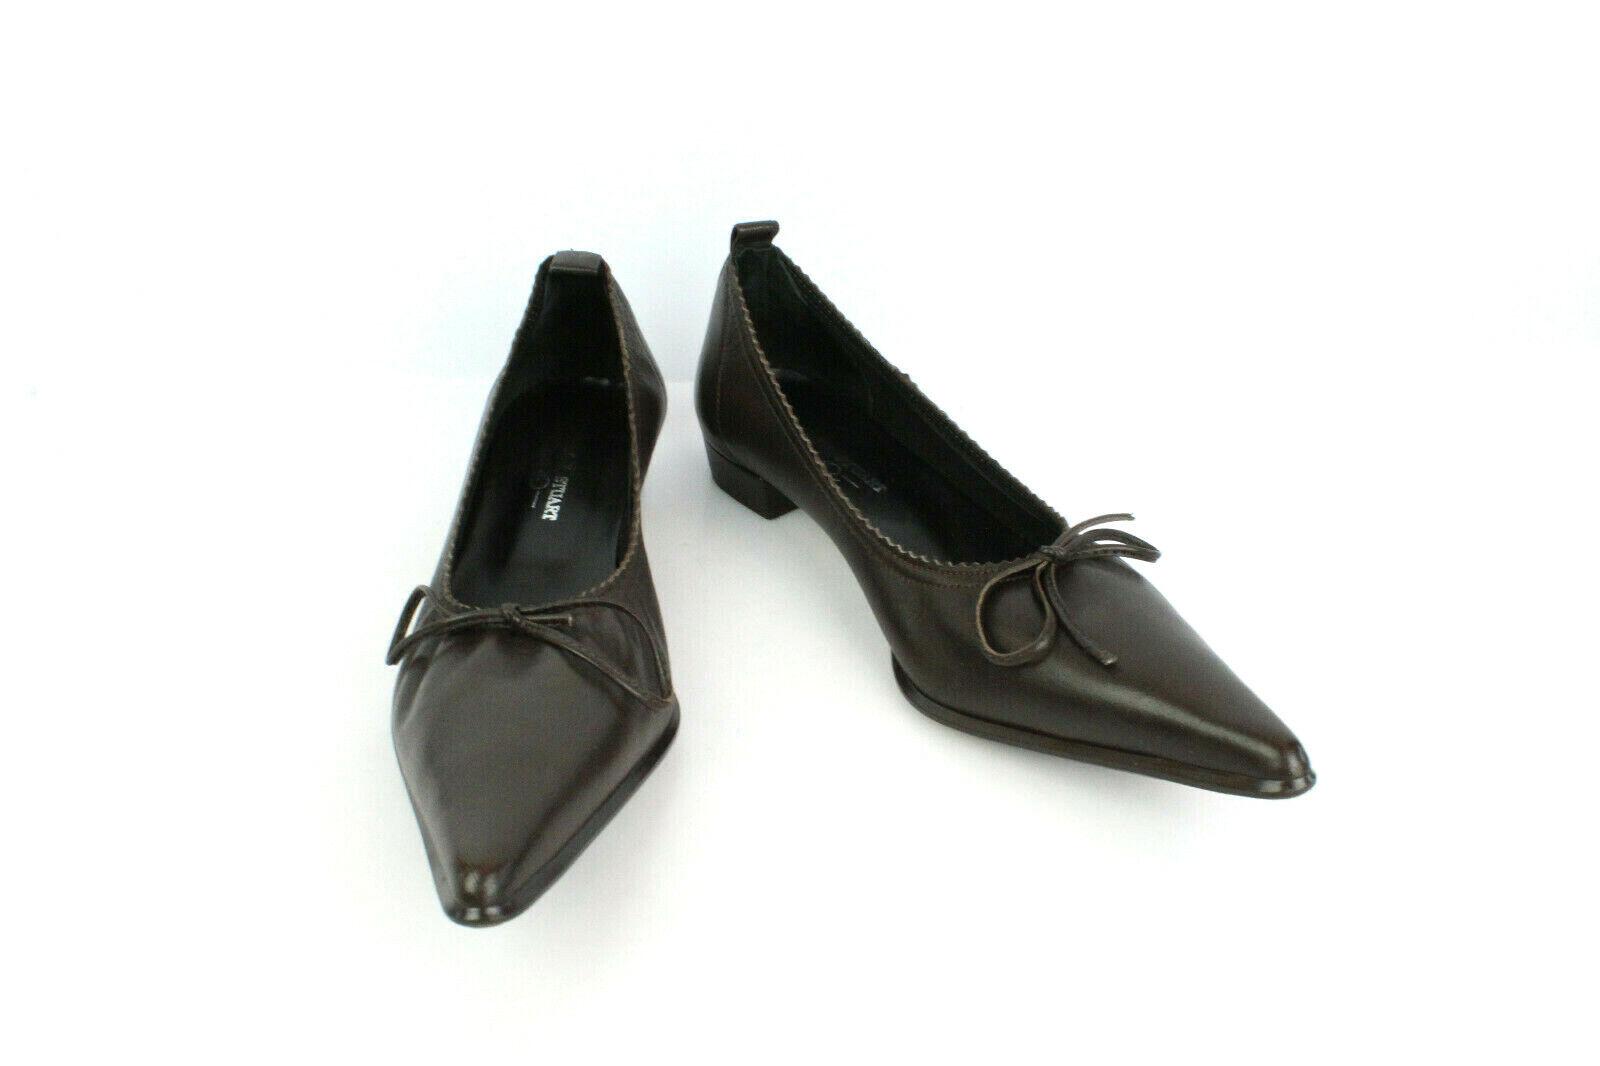 Court shoes ELIZABETH STUART Brown Leather T 36   UK 3.5 VERY GOOD CONDITION